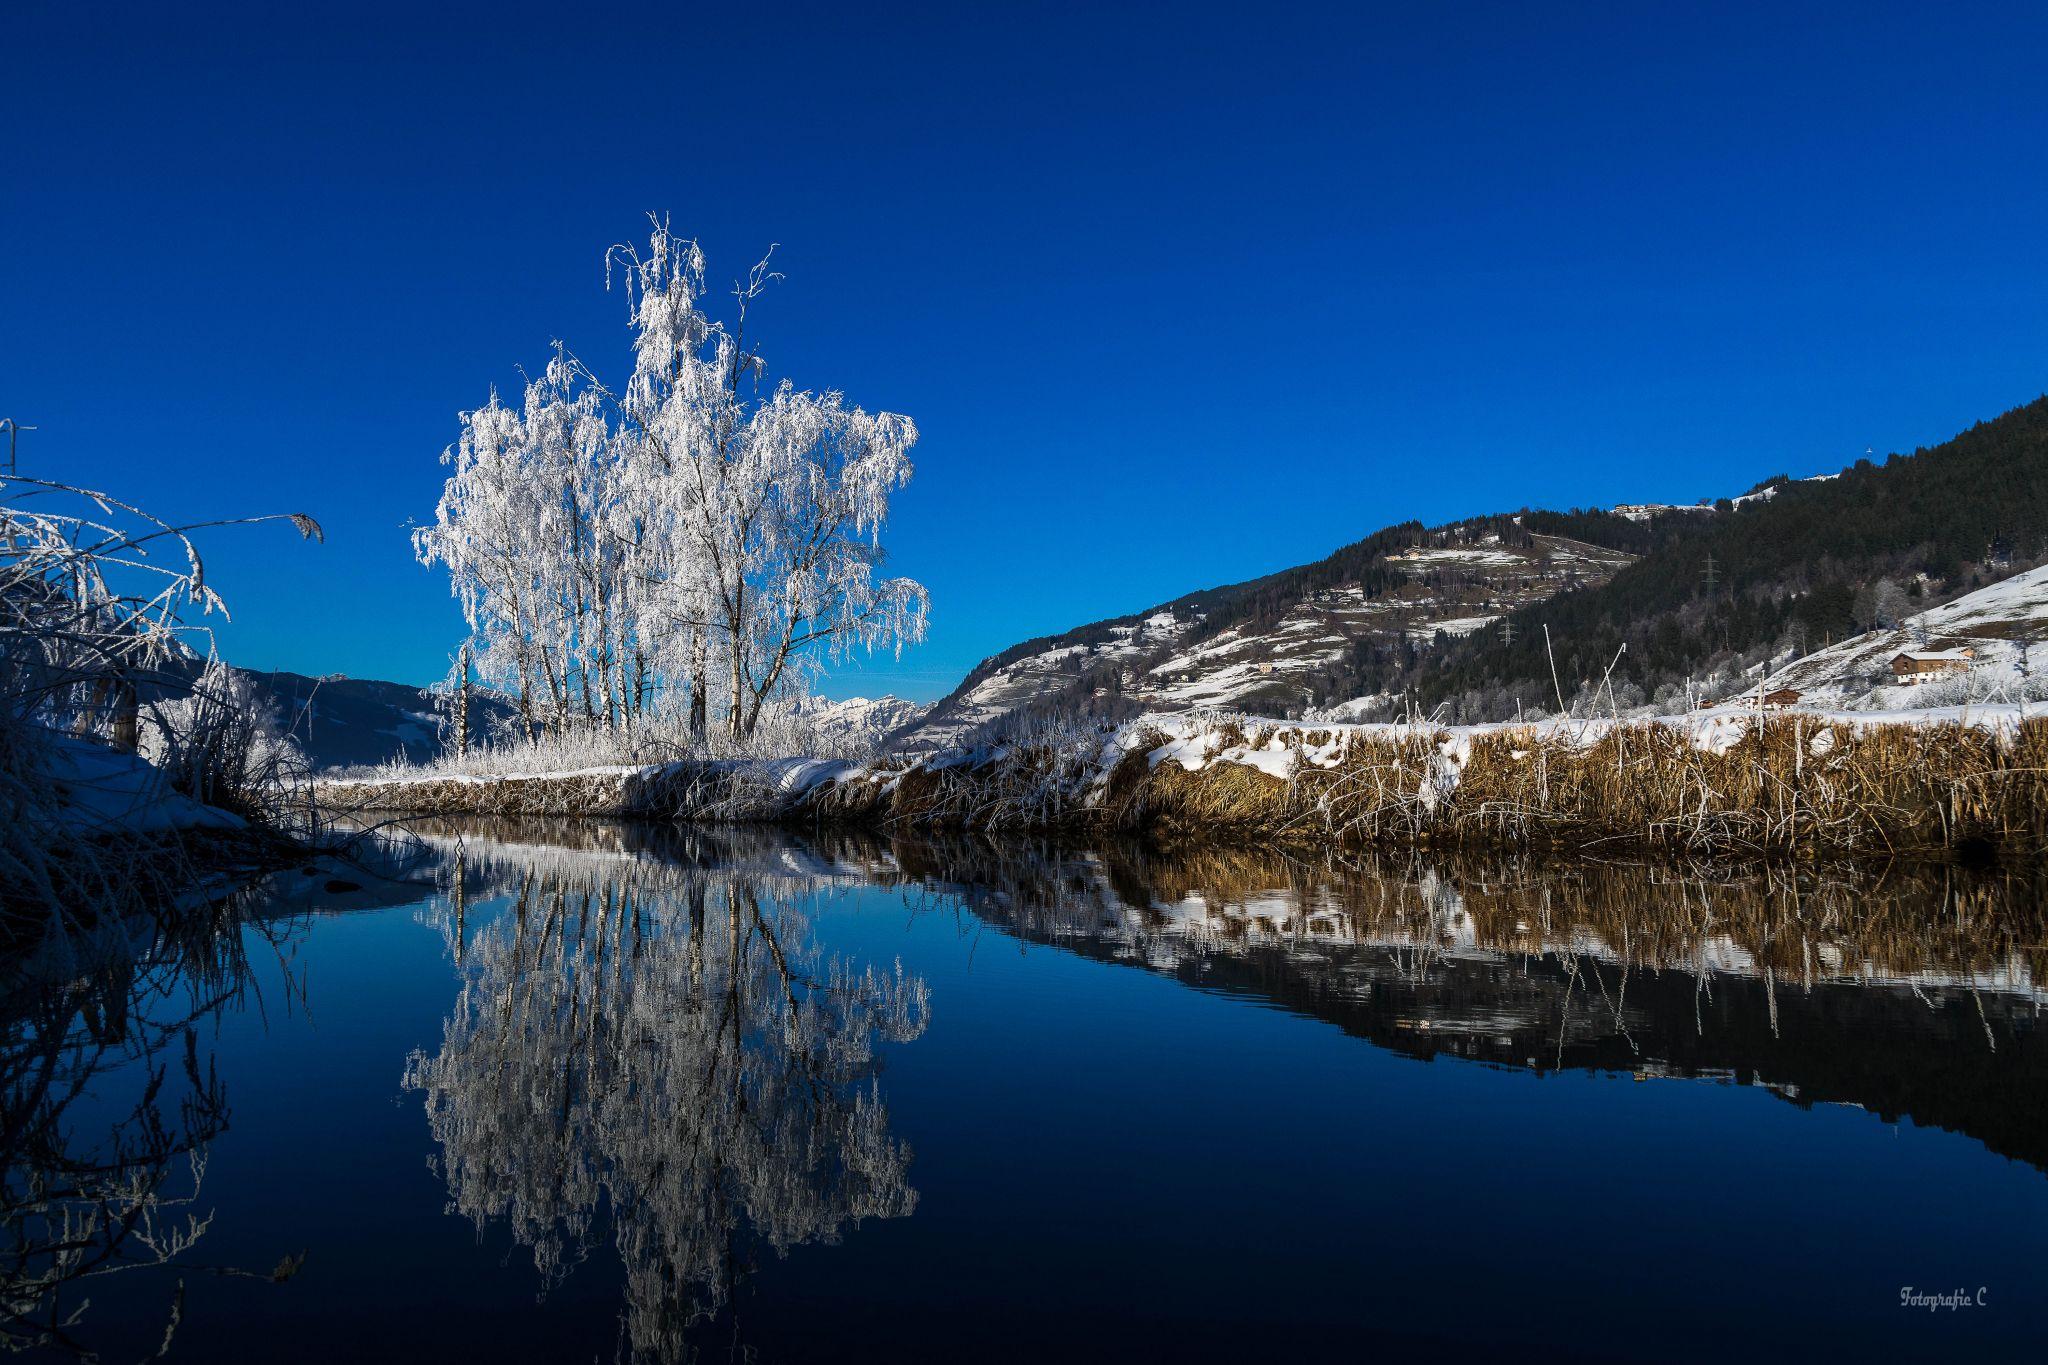 South of Lake of Zell, Austria, Austria